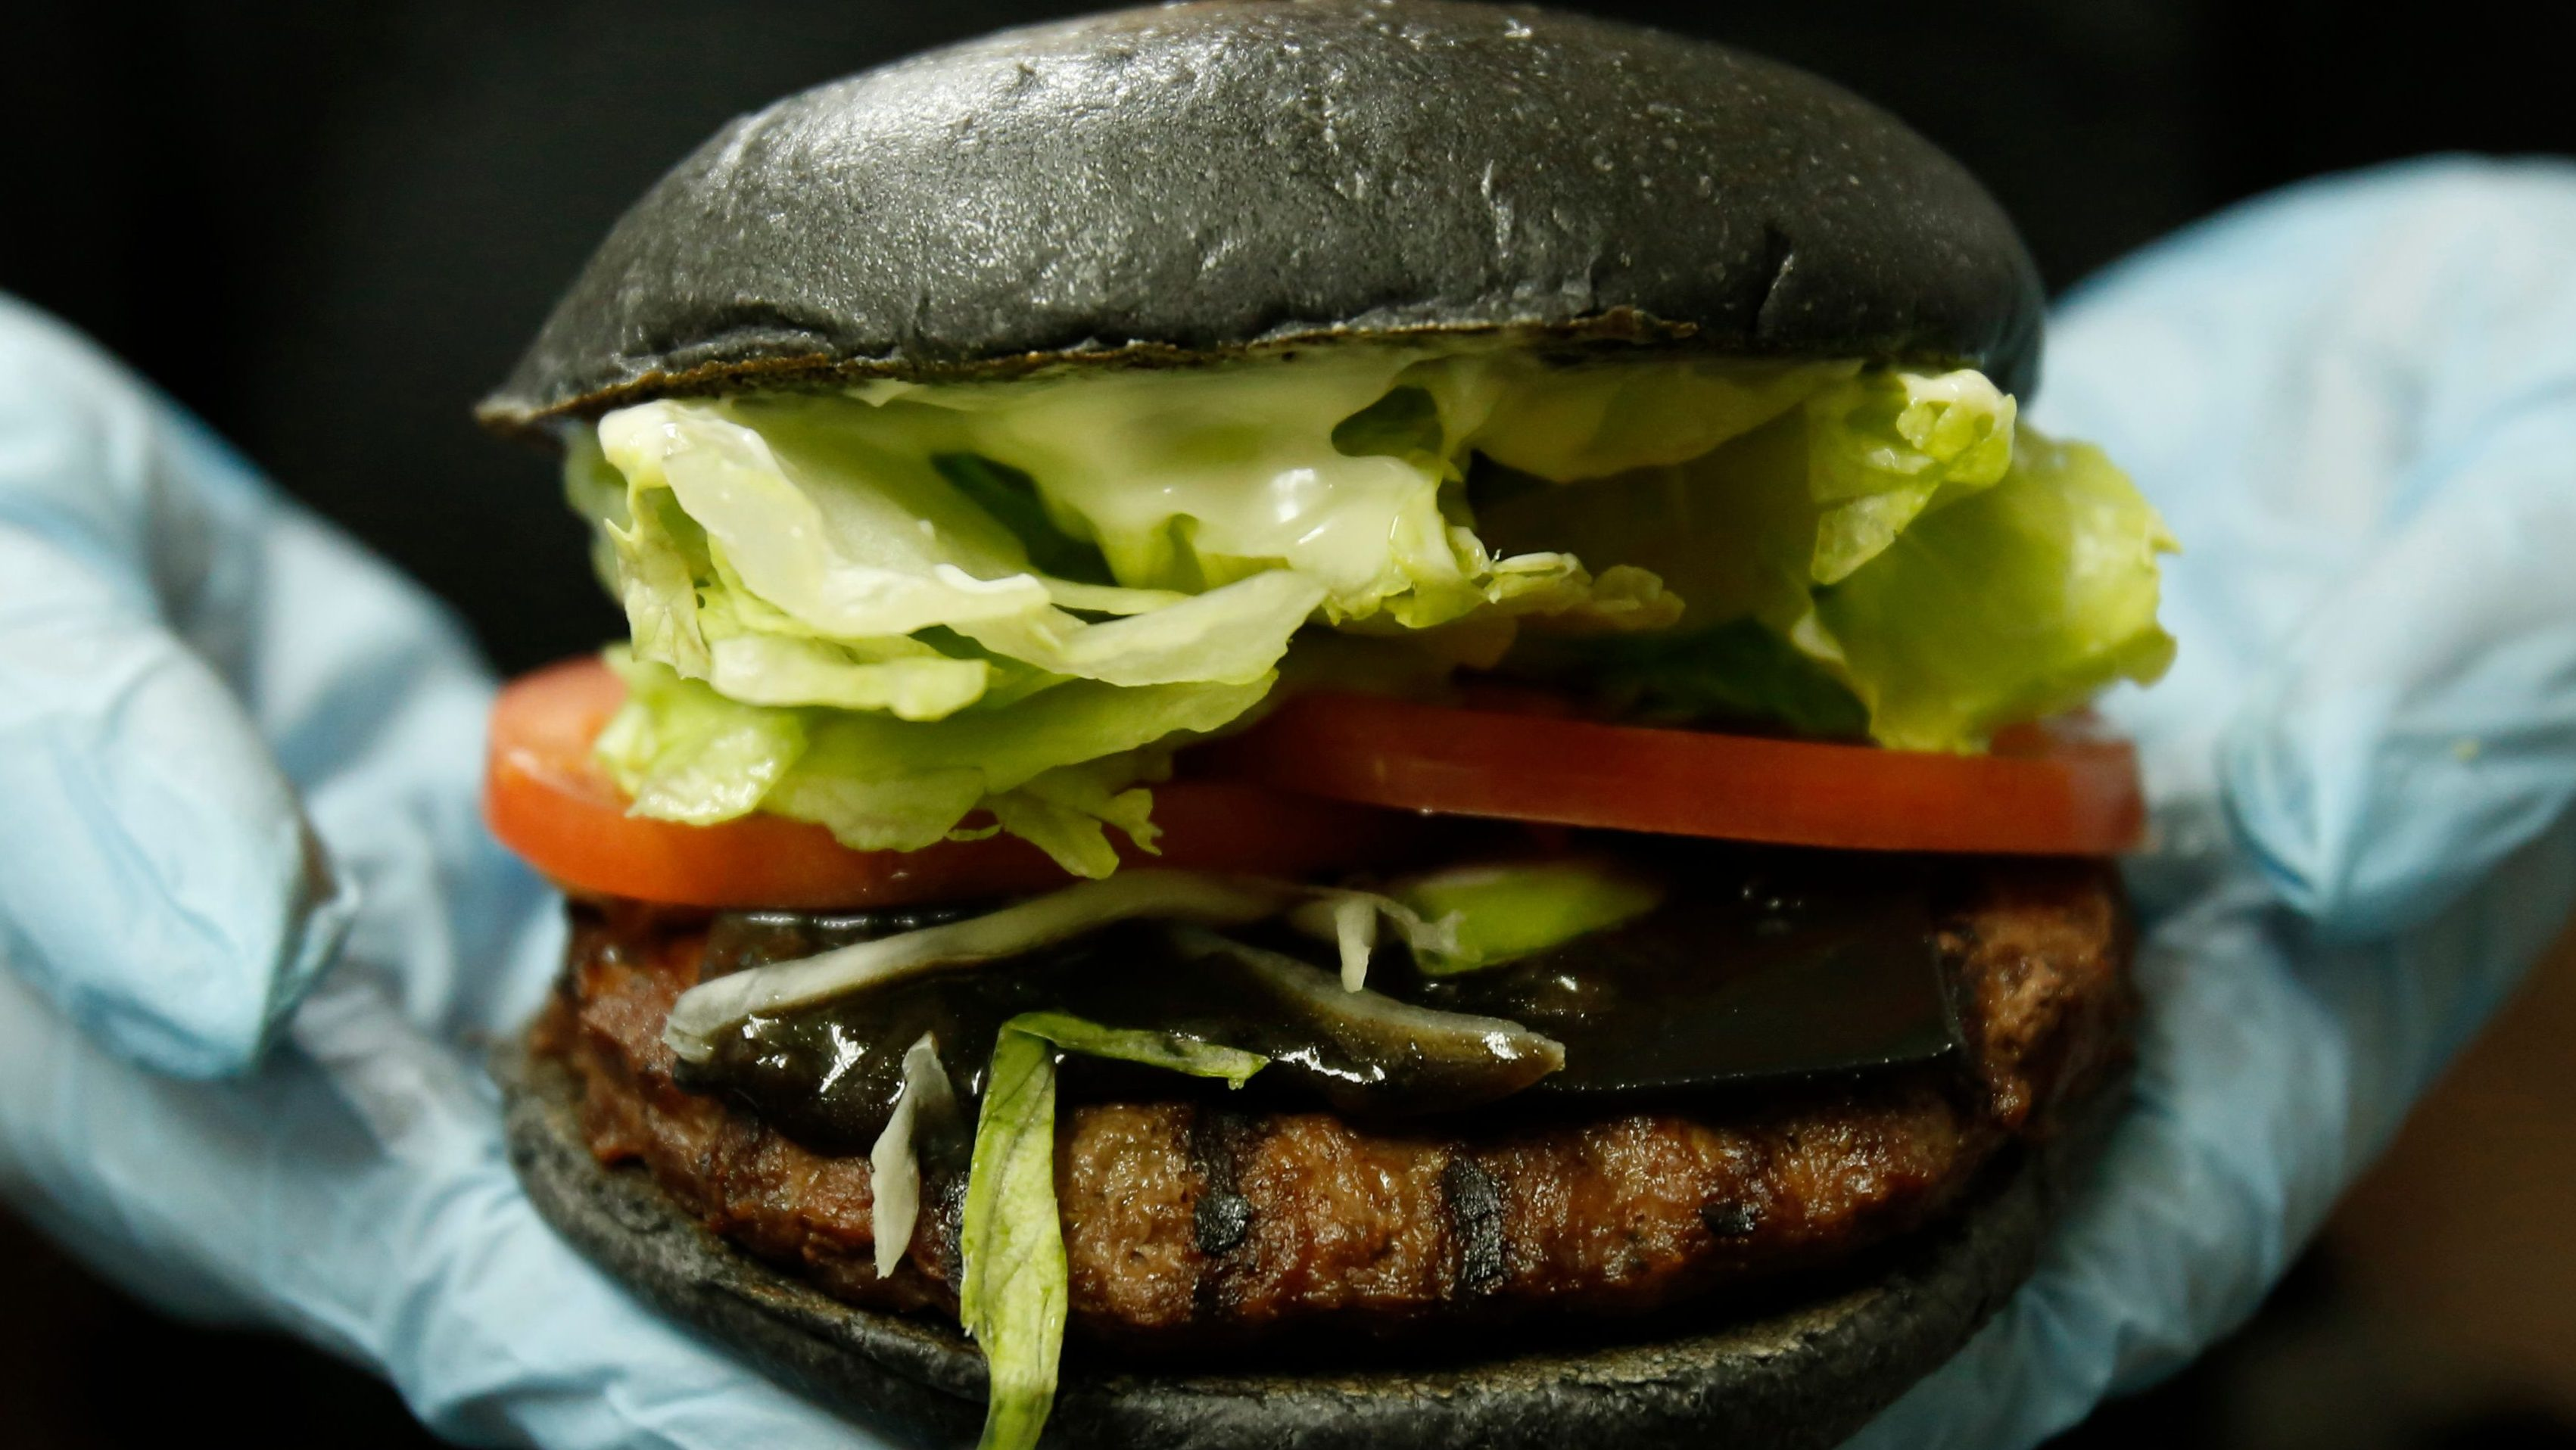 photo Burger Kings Halloween Slushie Might Be Giving People Black Poop